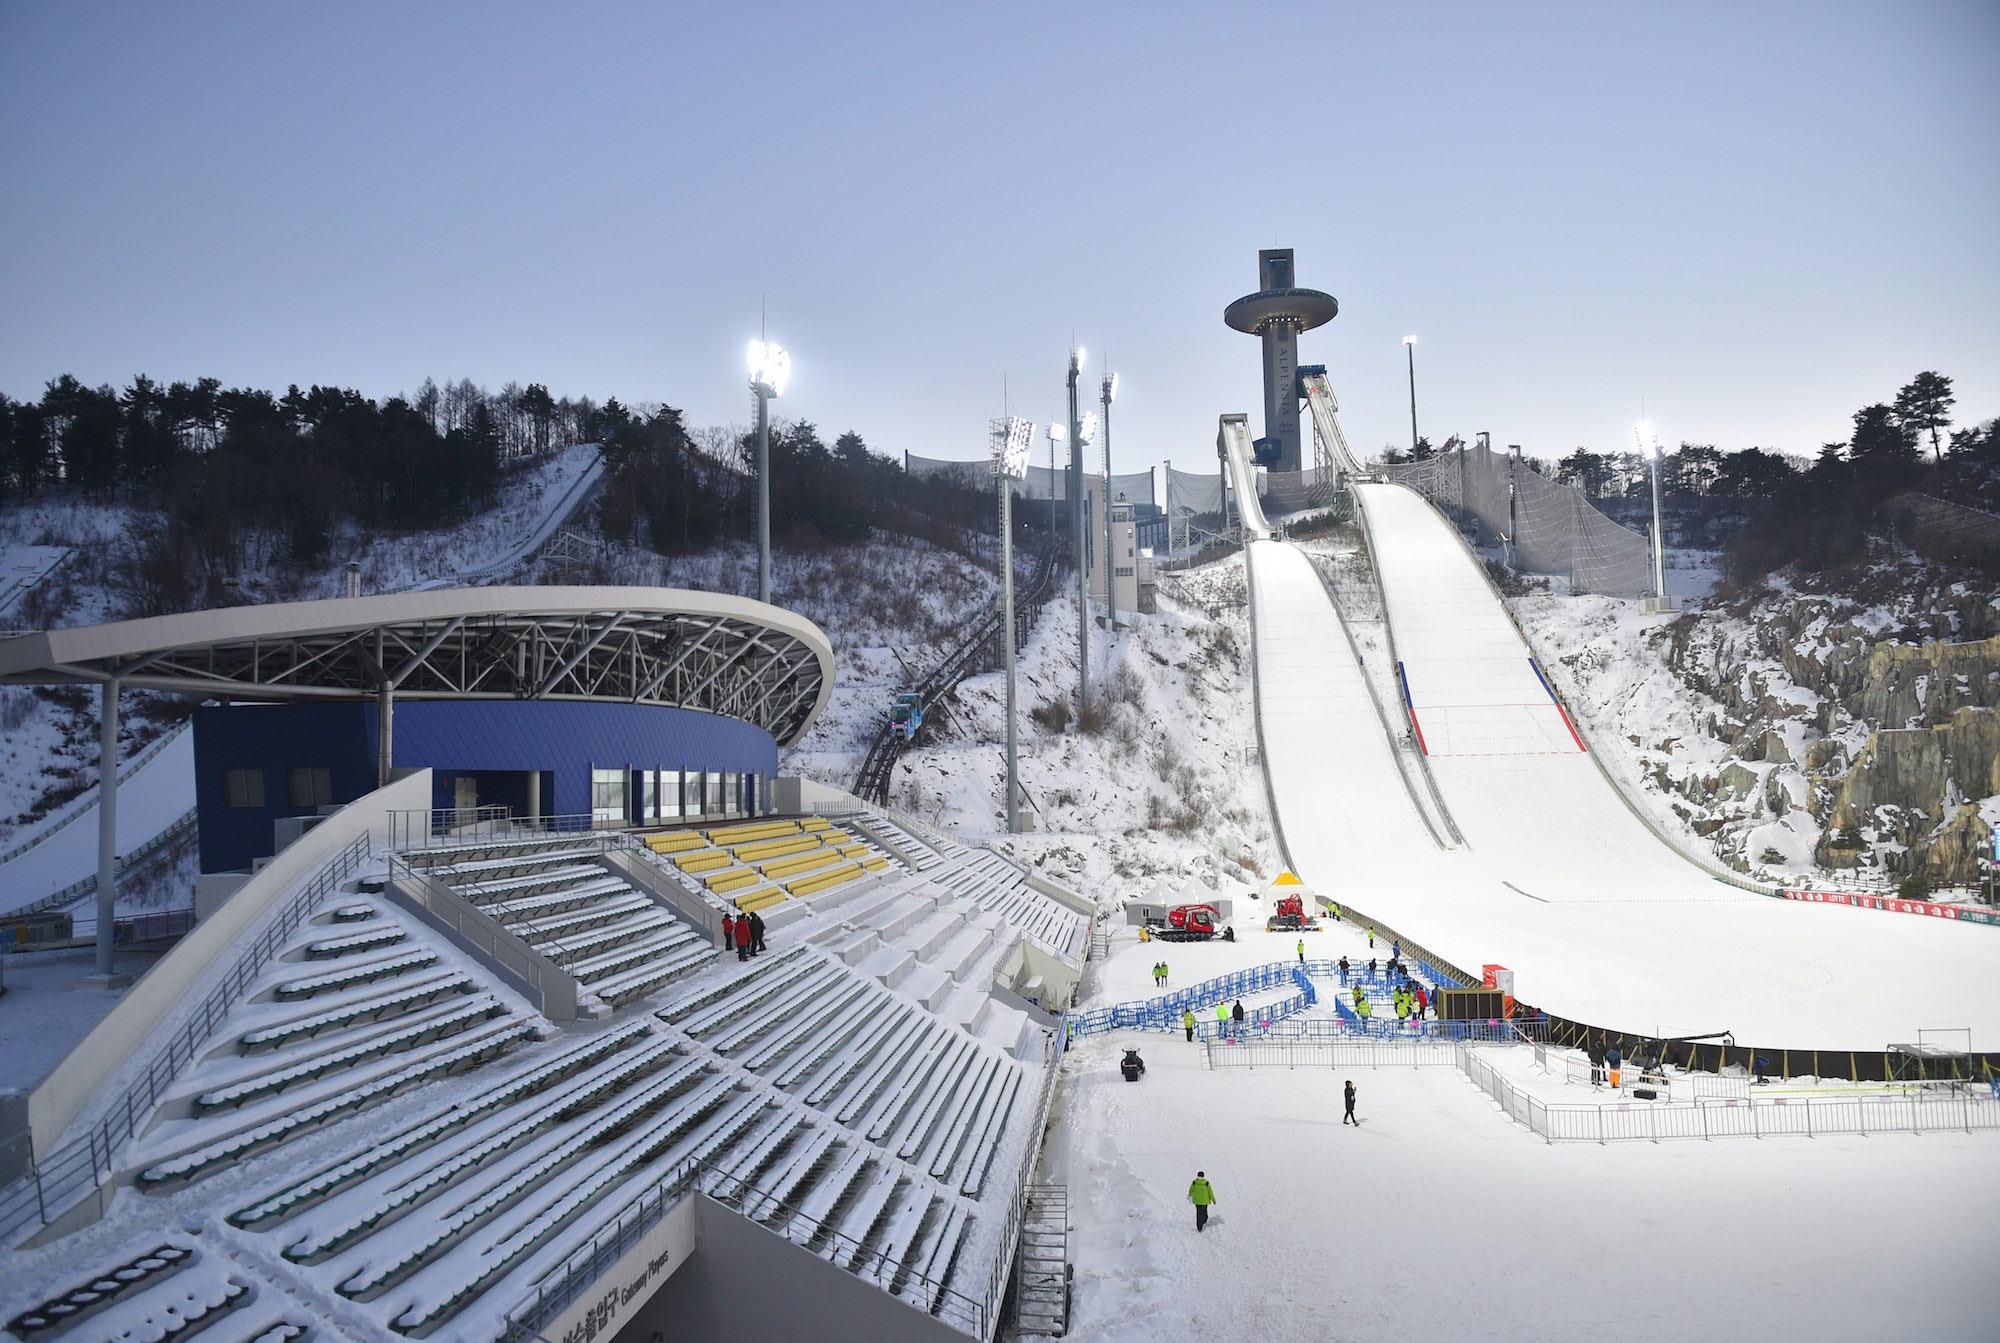 pyeongchang and south korean ski culture   cnn travel